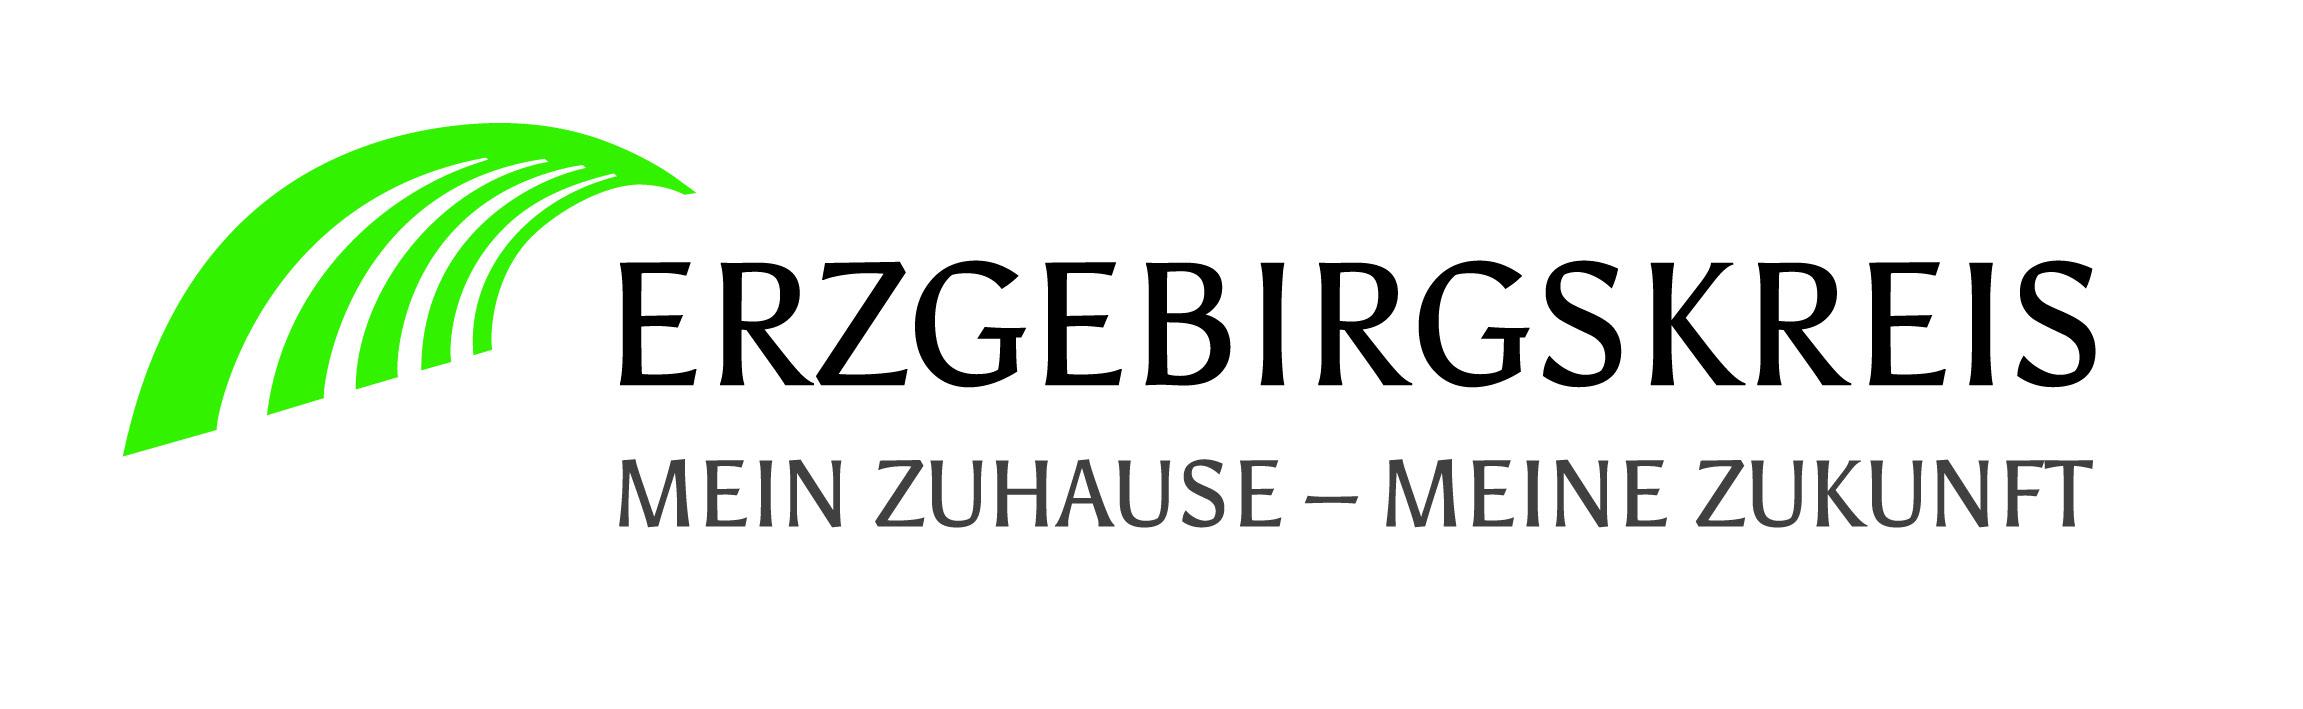 Logo des Erzgebirgskreises